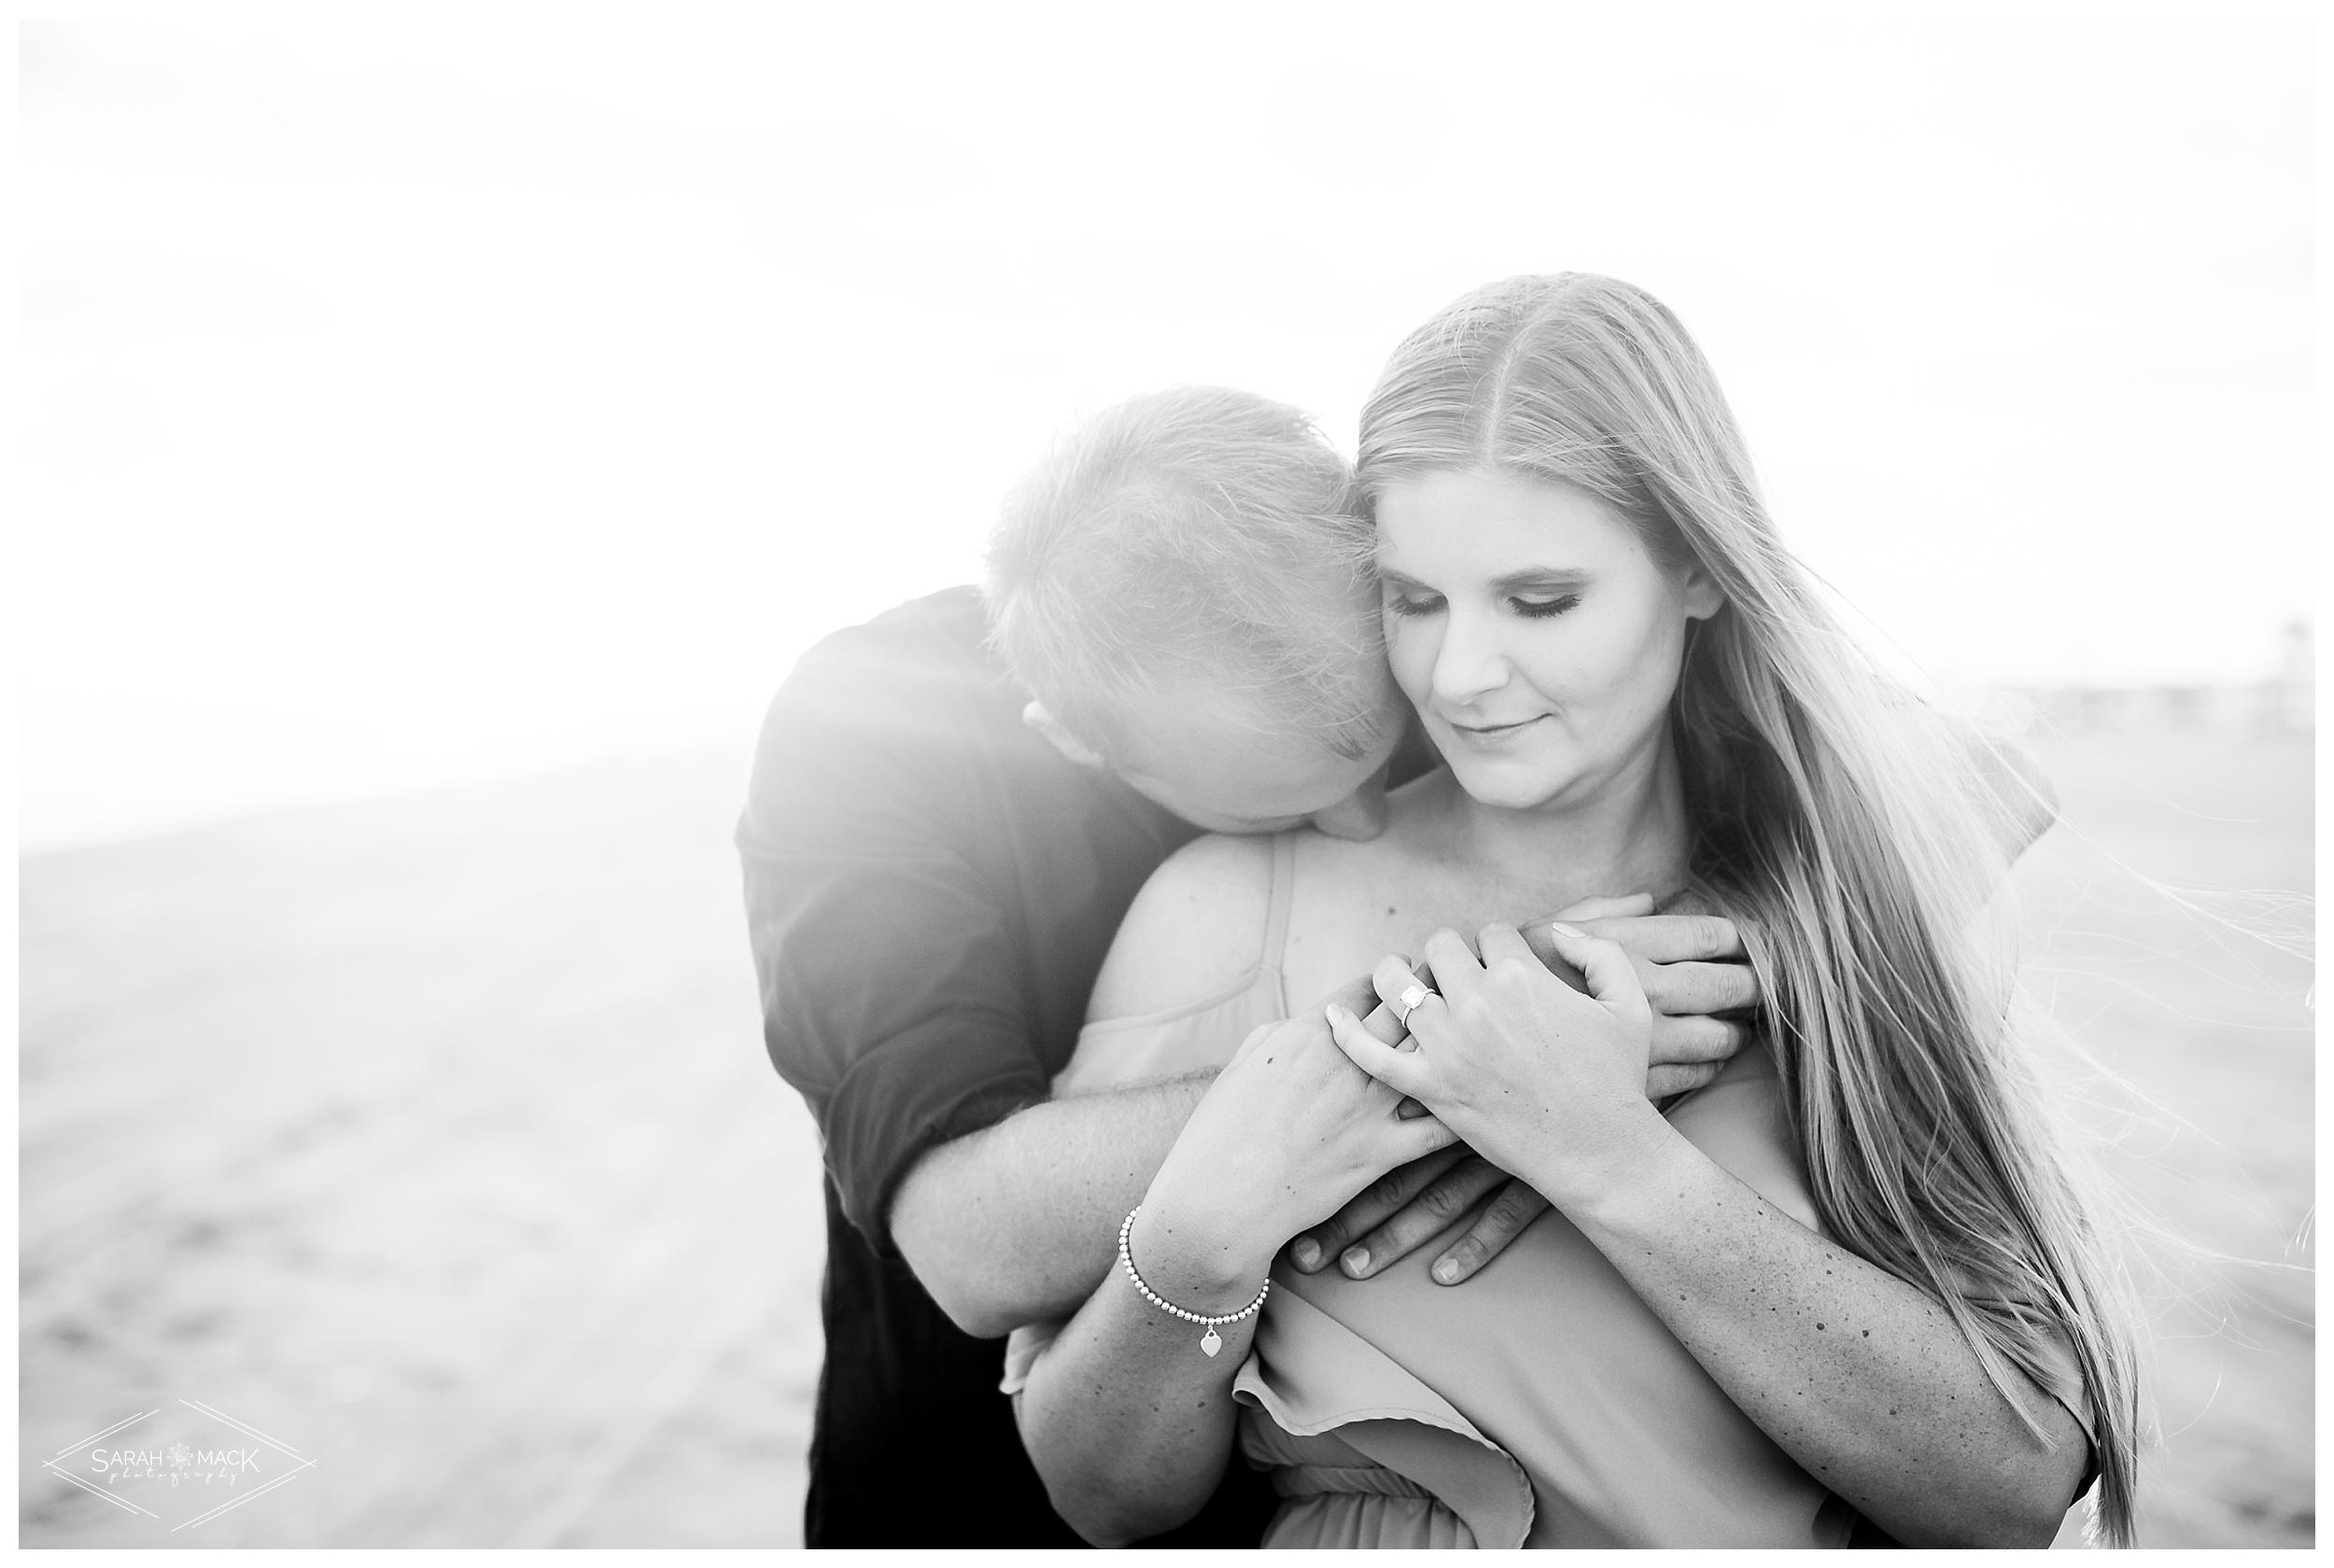 HI_Balboa_Island_Newport-Beach-Engagement-Photography-031.jpg